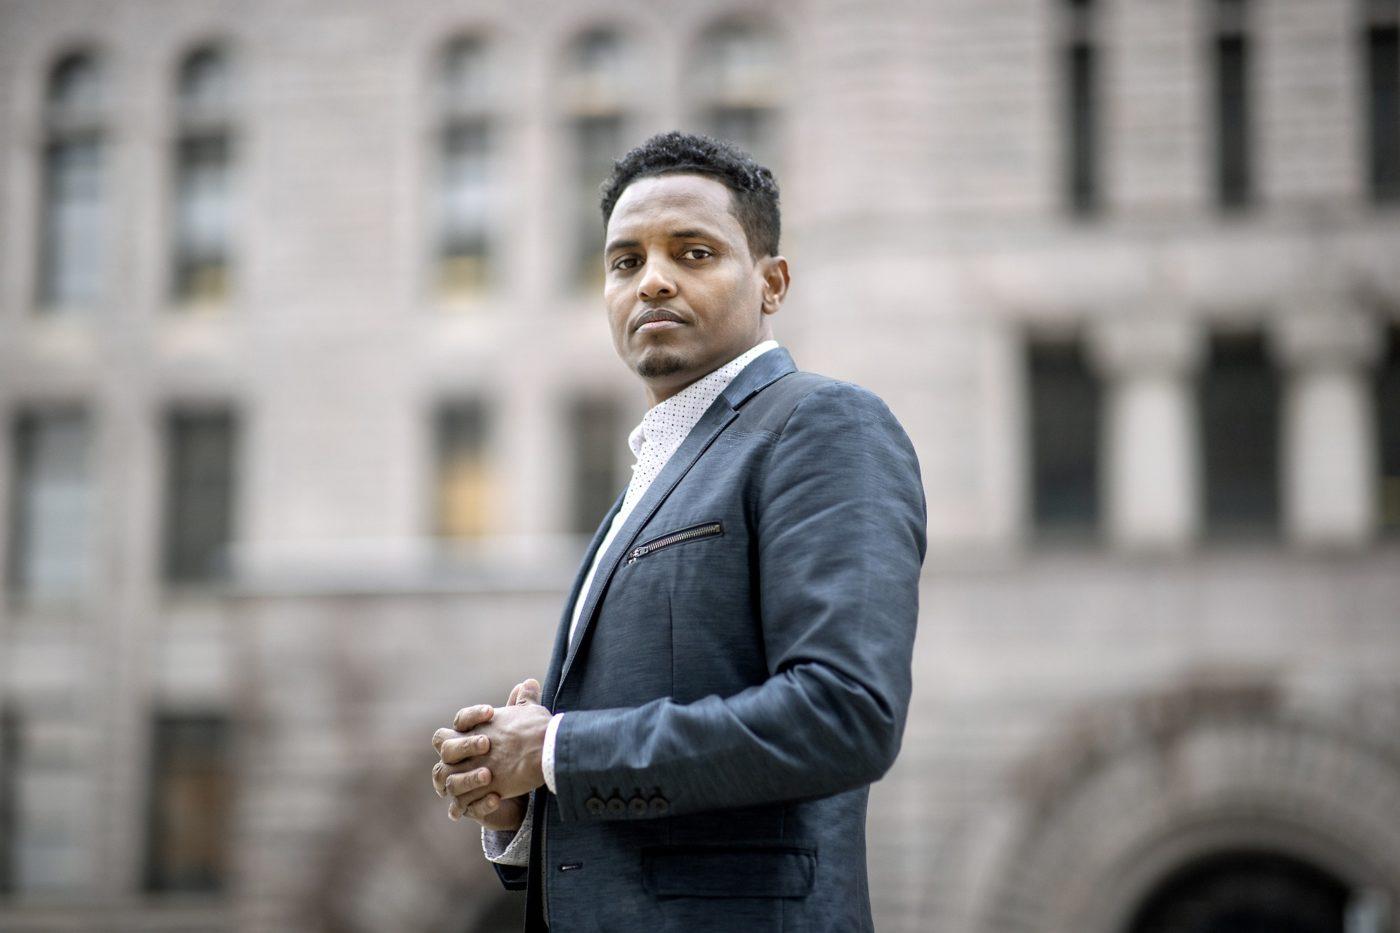 Jamal Osman of ward 6